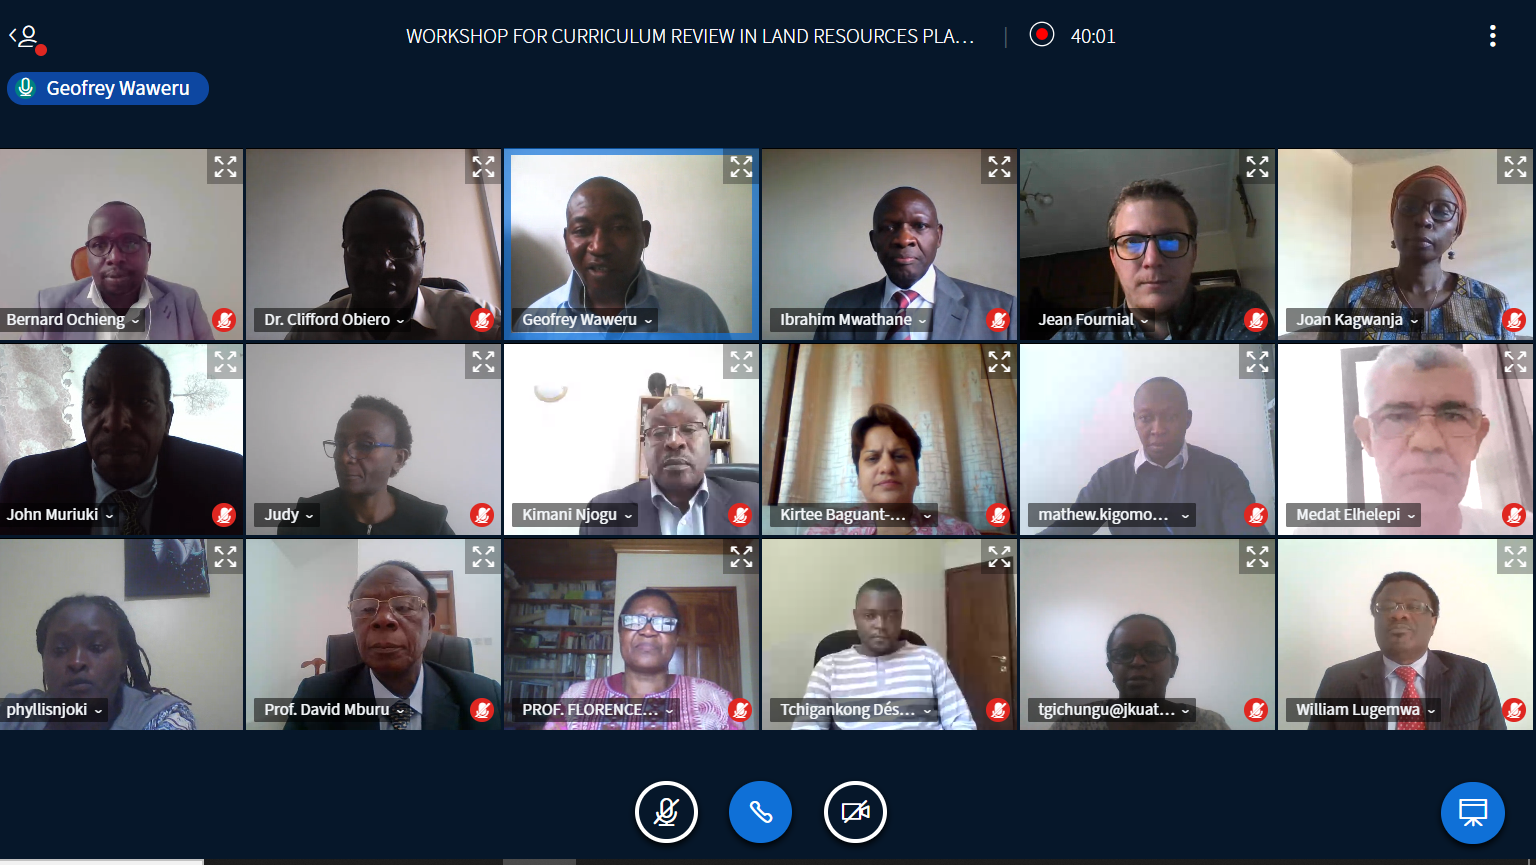 ALPC, JKUAT Launch Land Governance Curriculum Review Process in Kenya